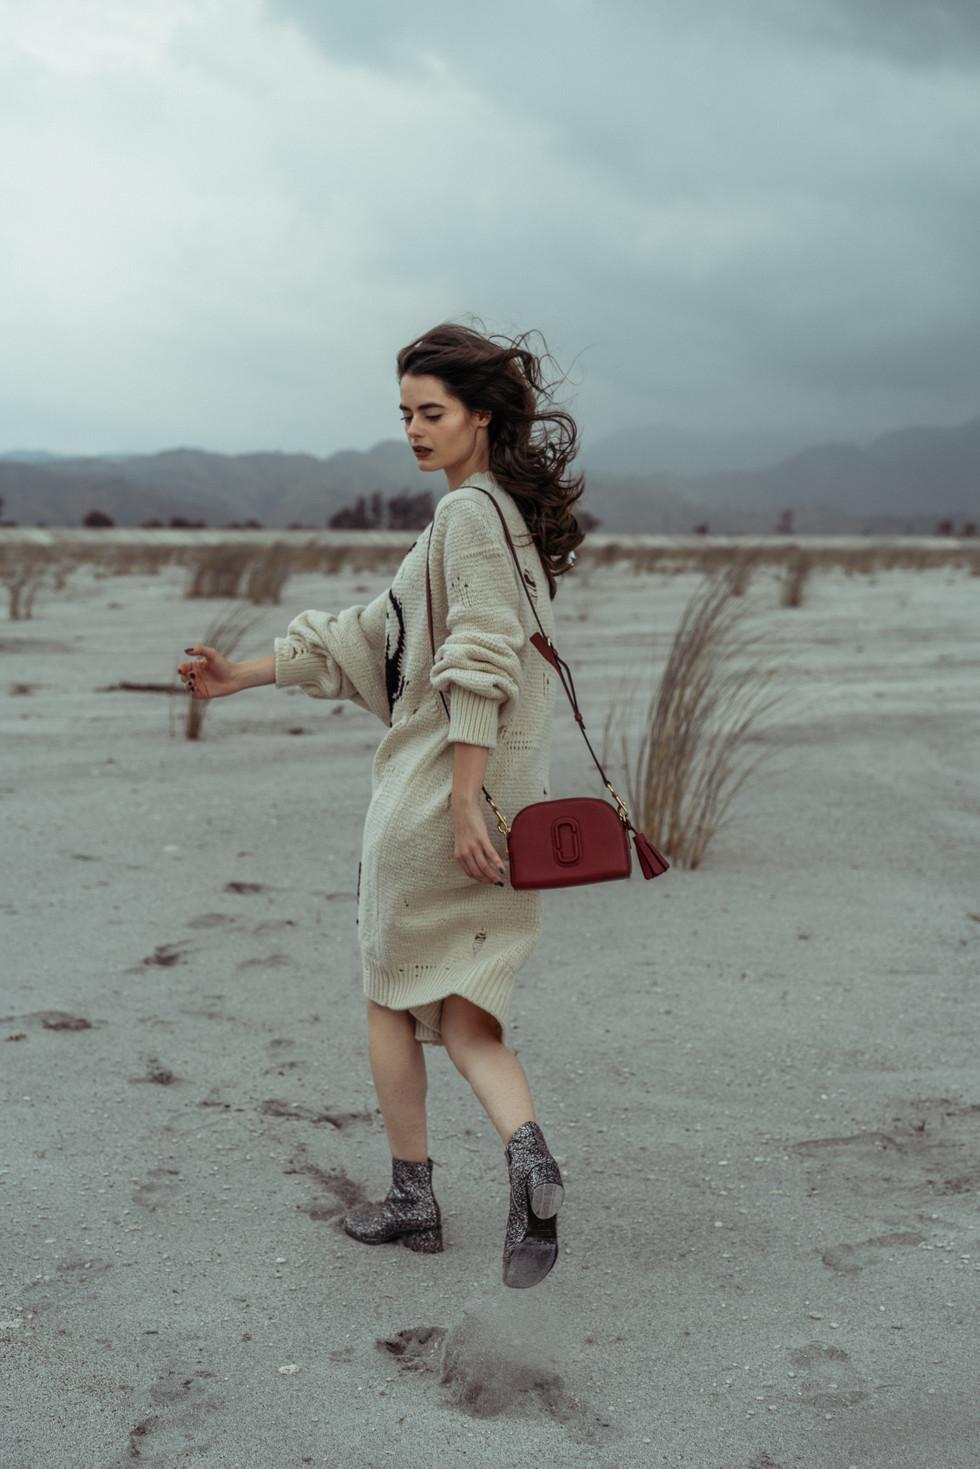 Photographer: Artu Nepomuceno Stylist: Meg Manzano Hairstylist: Carlo Umipig Model: Bronija Ales For L'Officiel Philippines